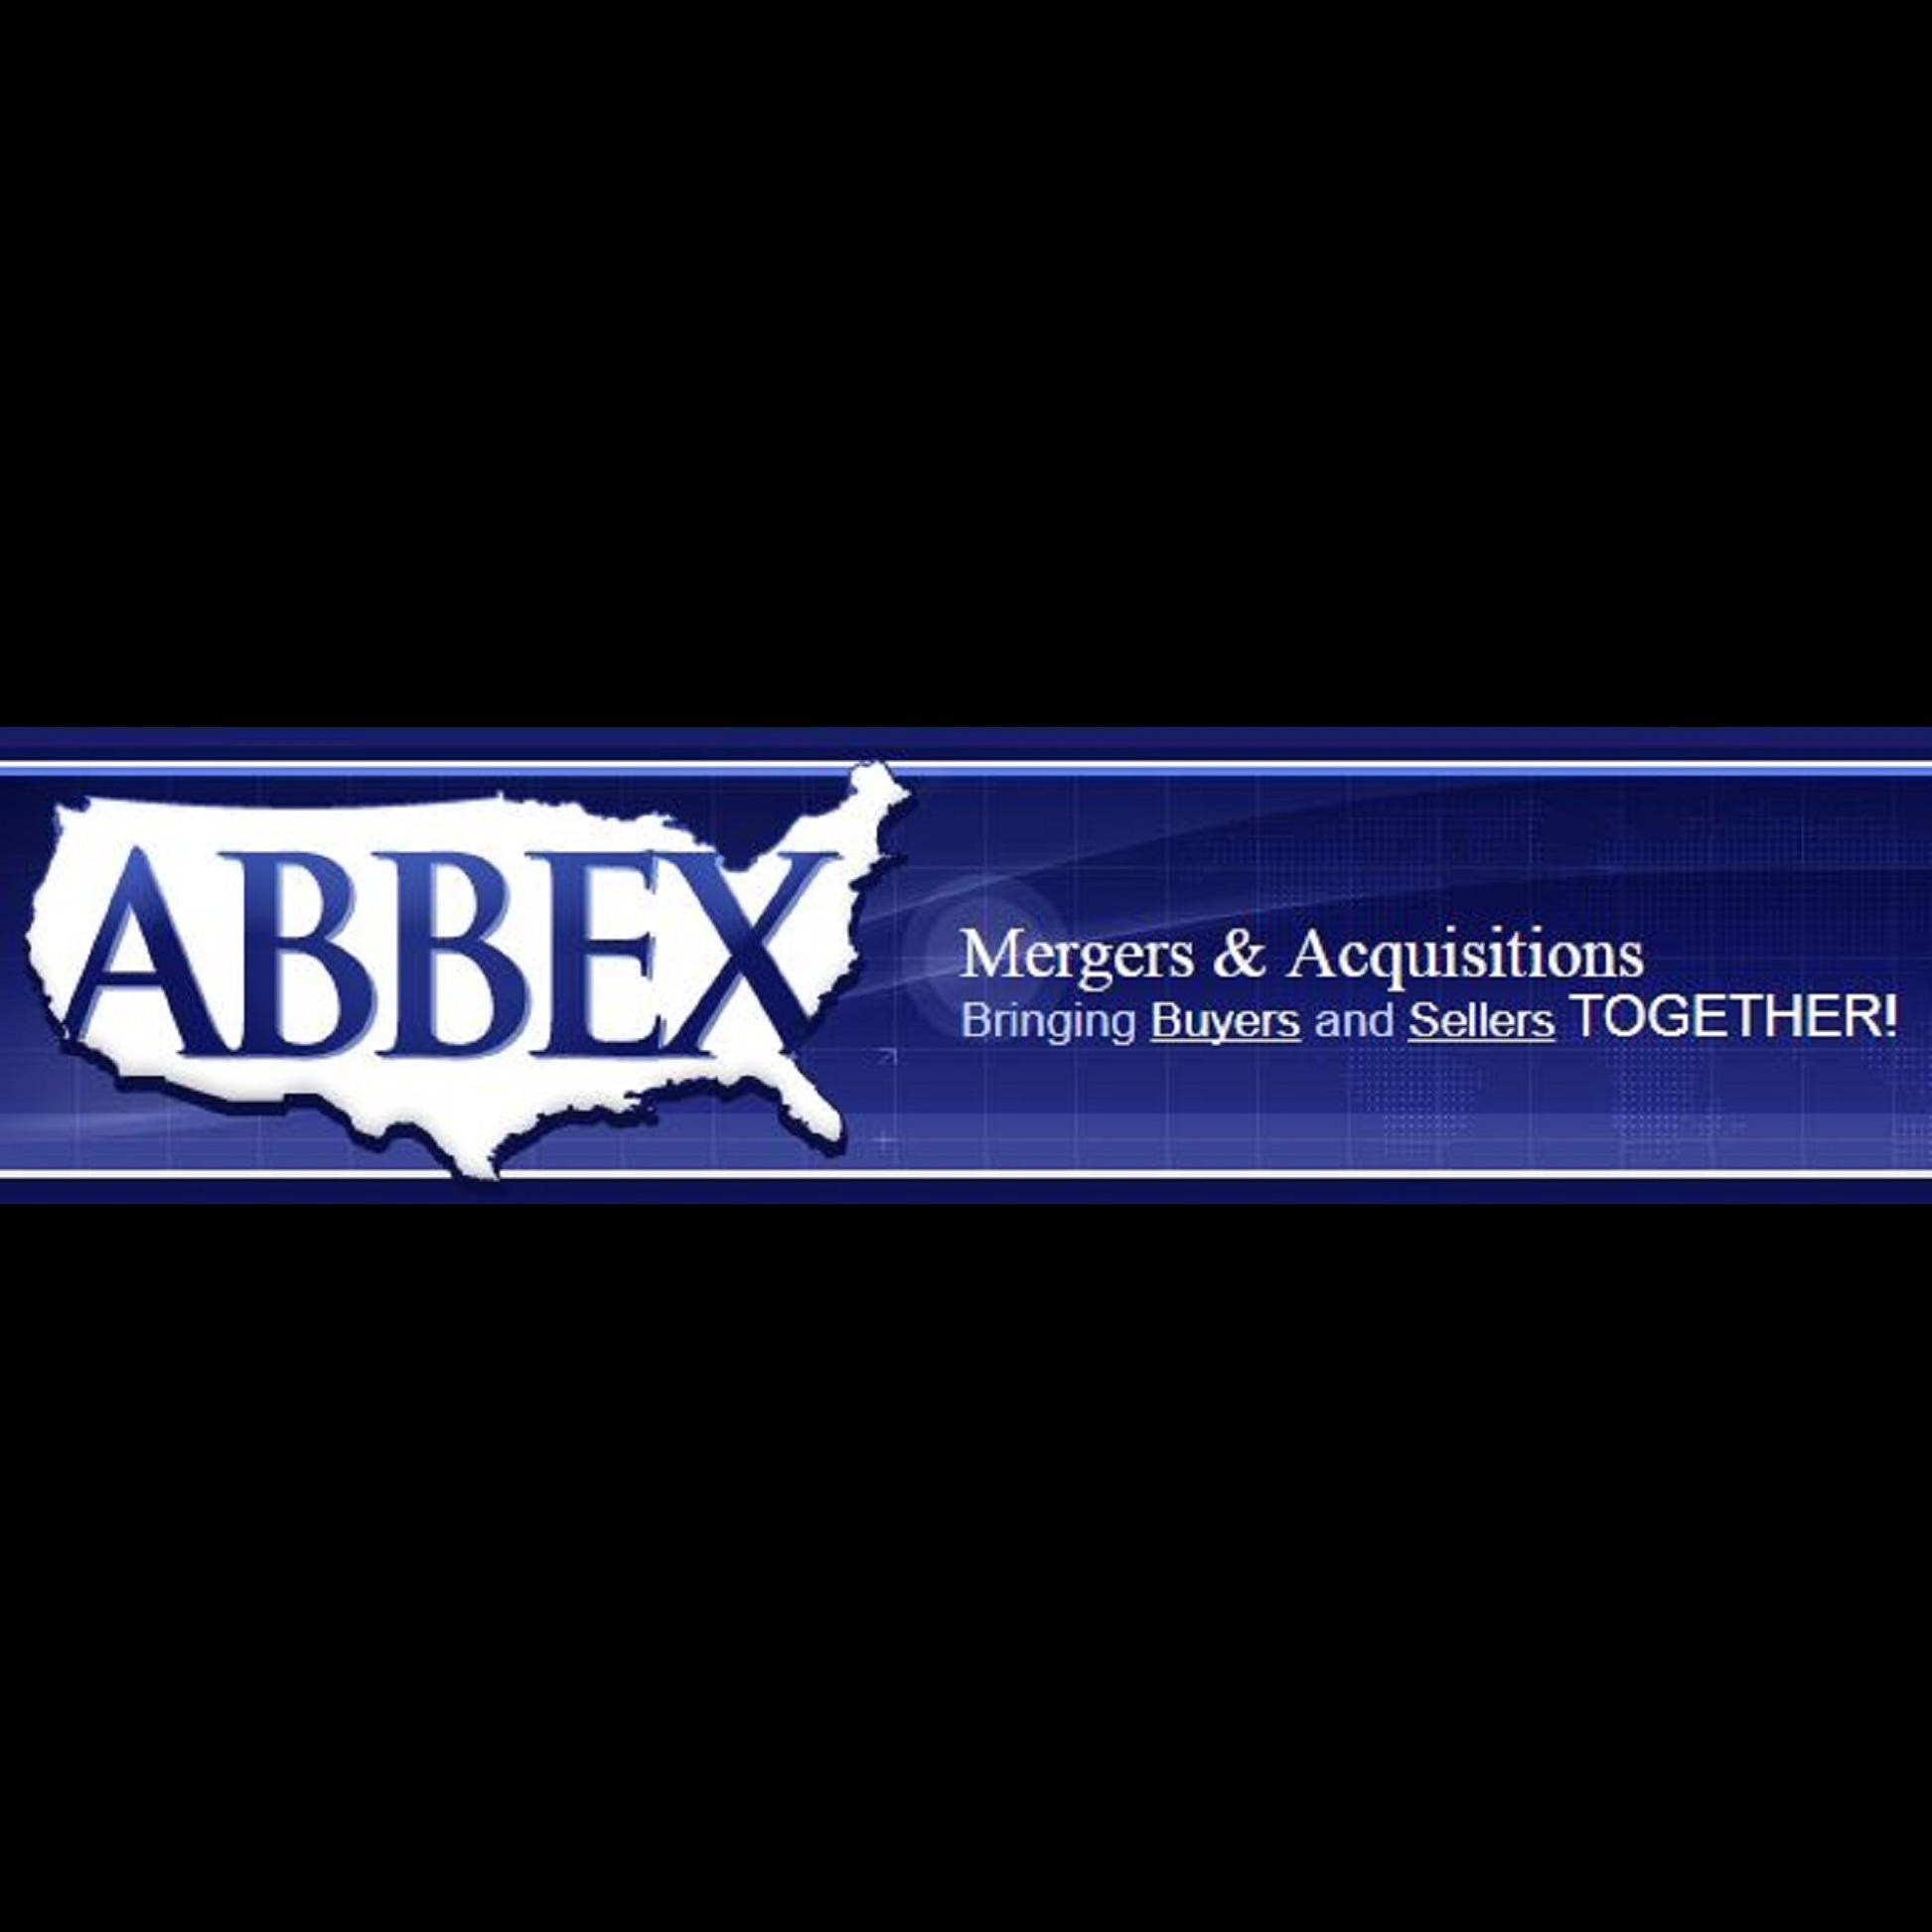 Abbex Inc